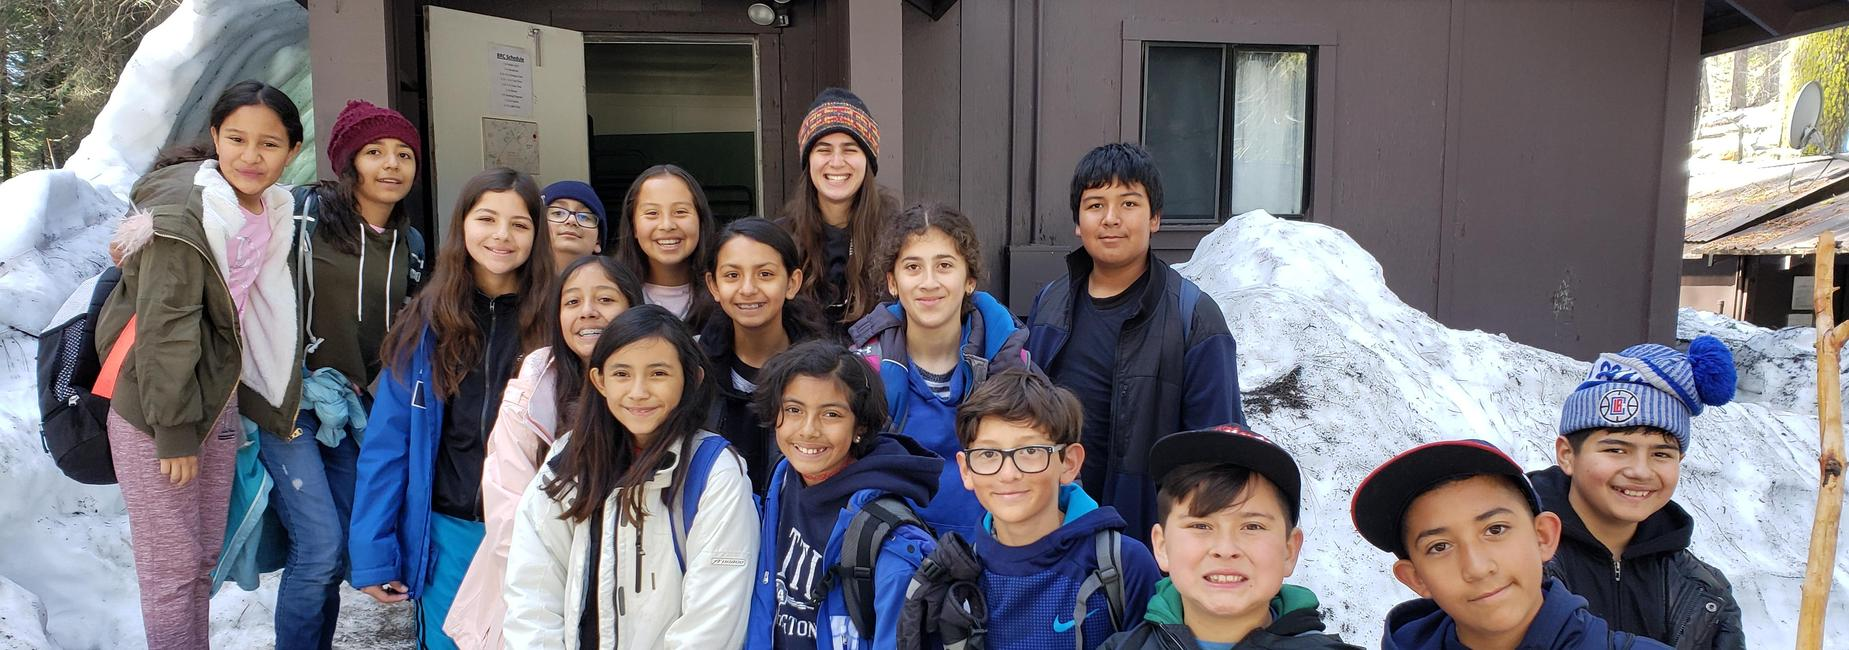 6th Graders in Yosemite